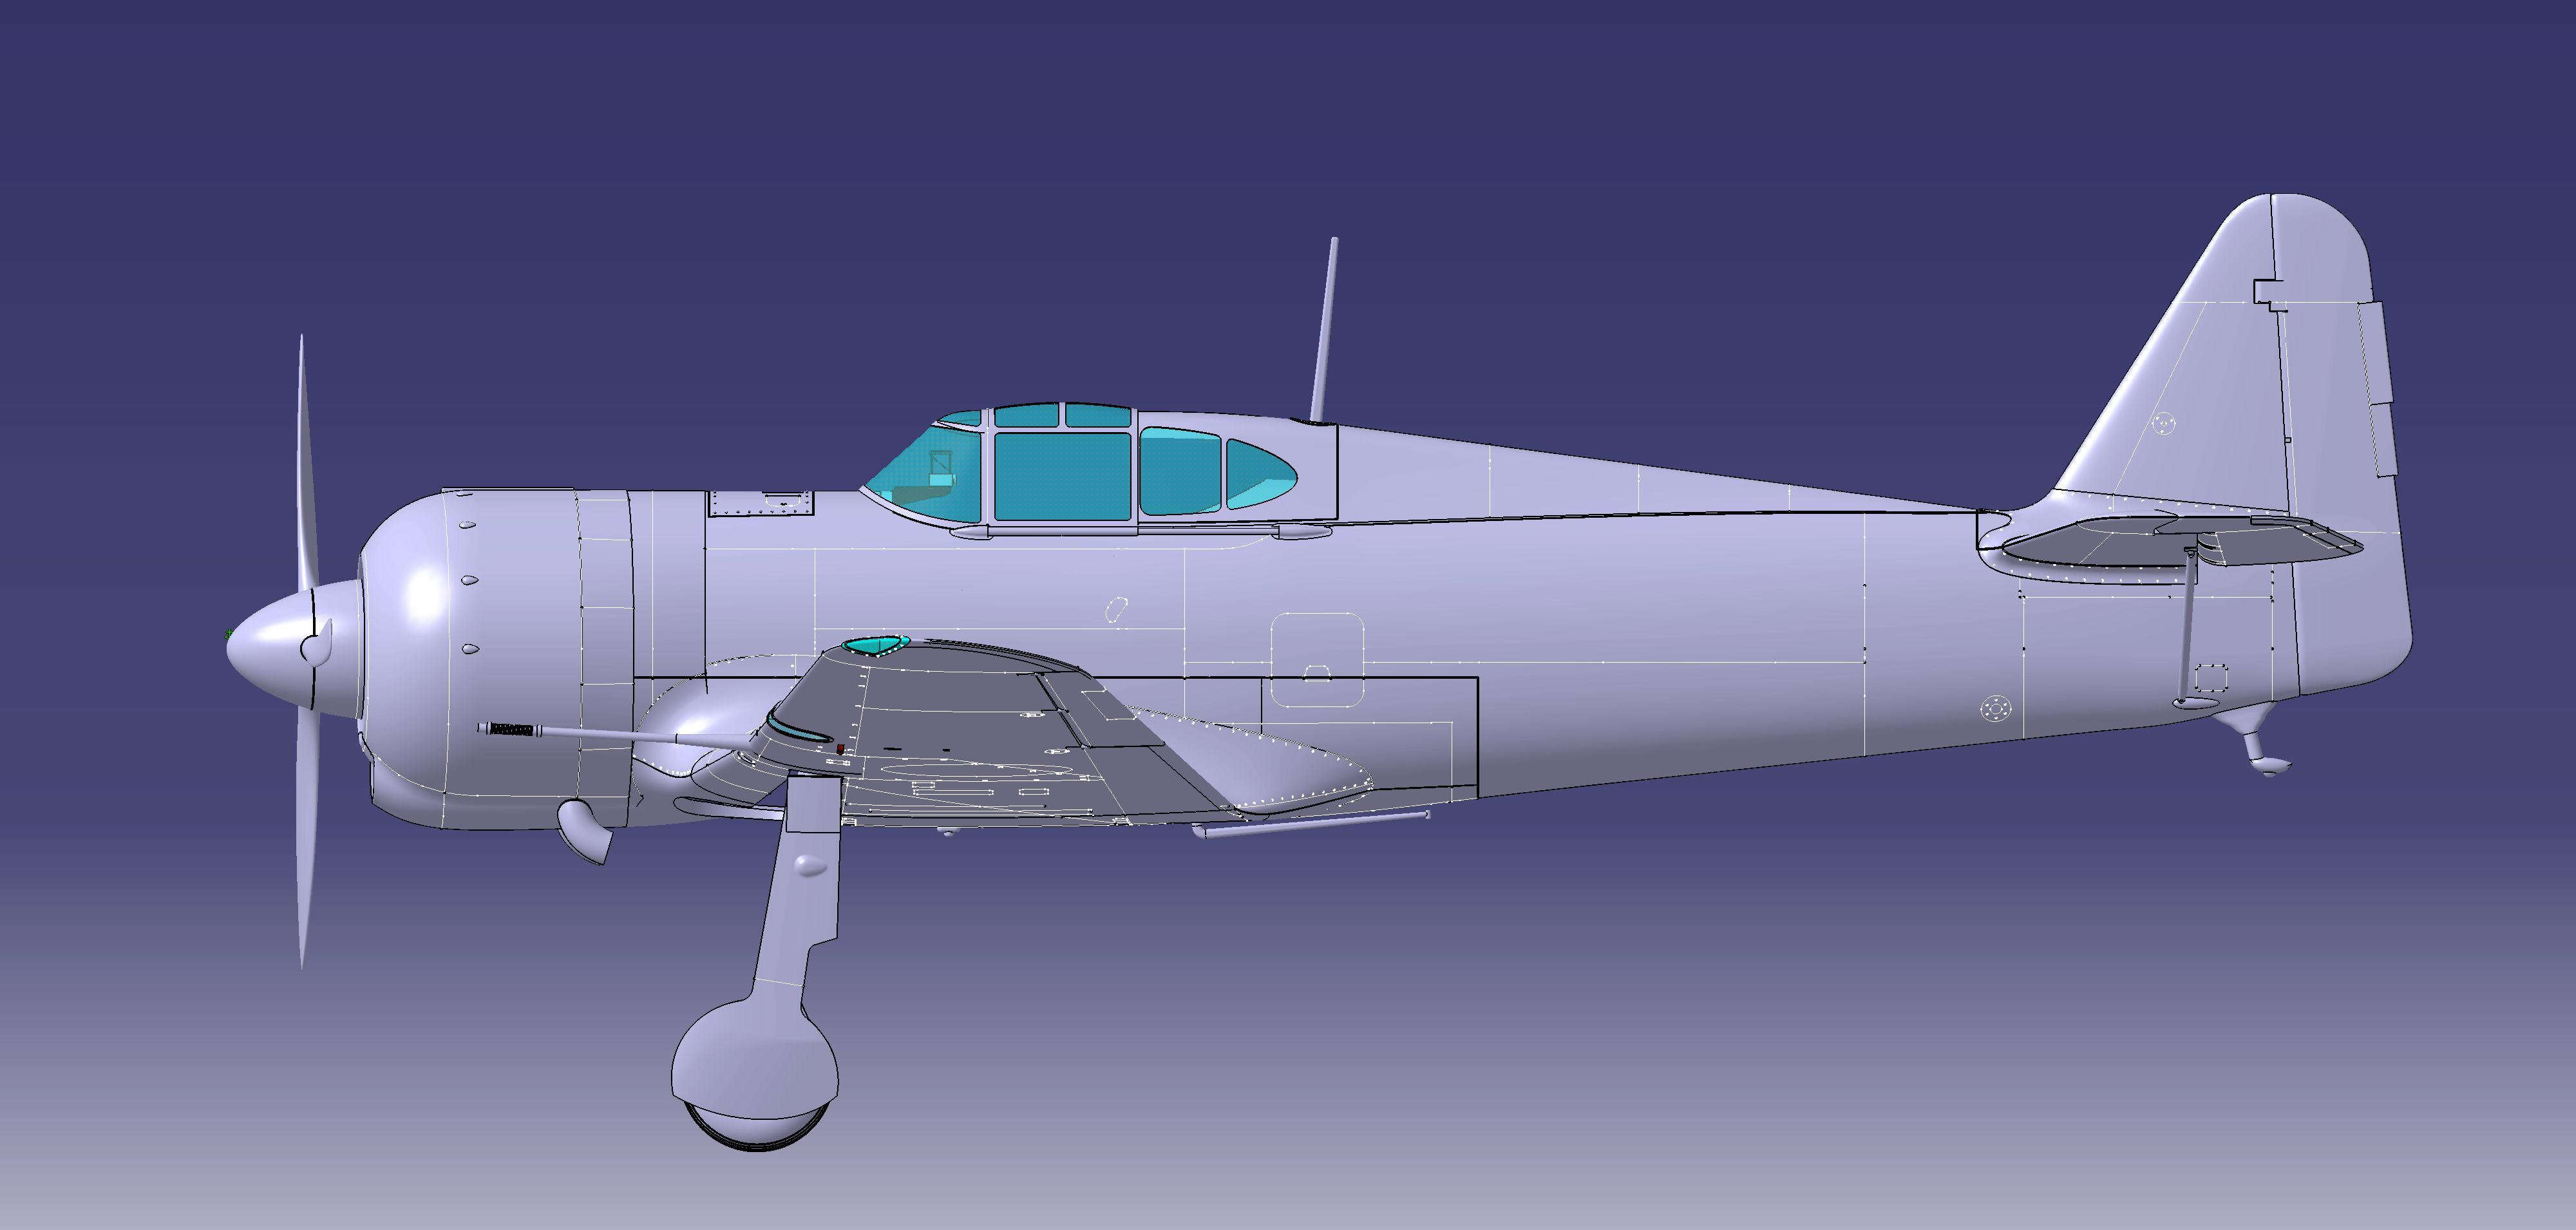 [RS-Models] Bloch MB.155 (80 ans montage 08) - Terminé !!! 19022512193058251